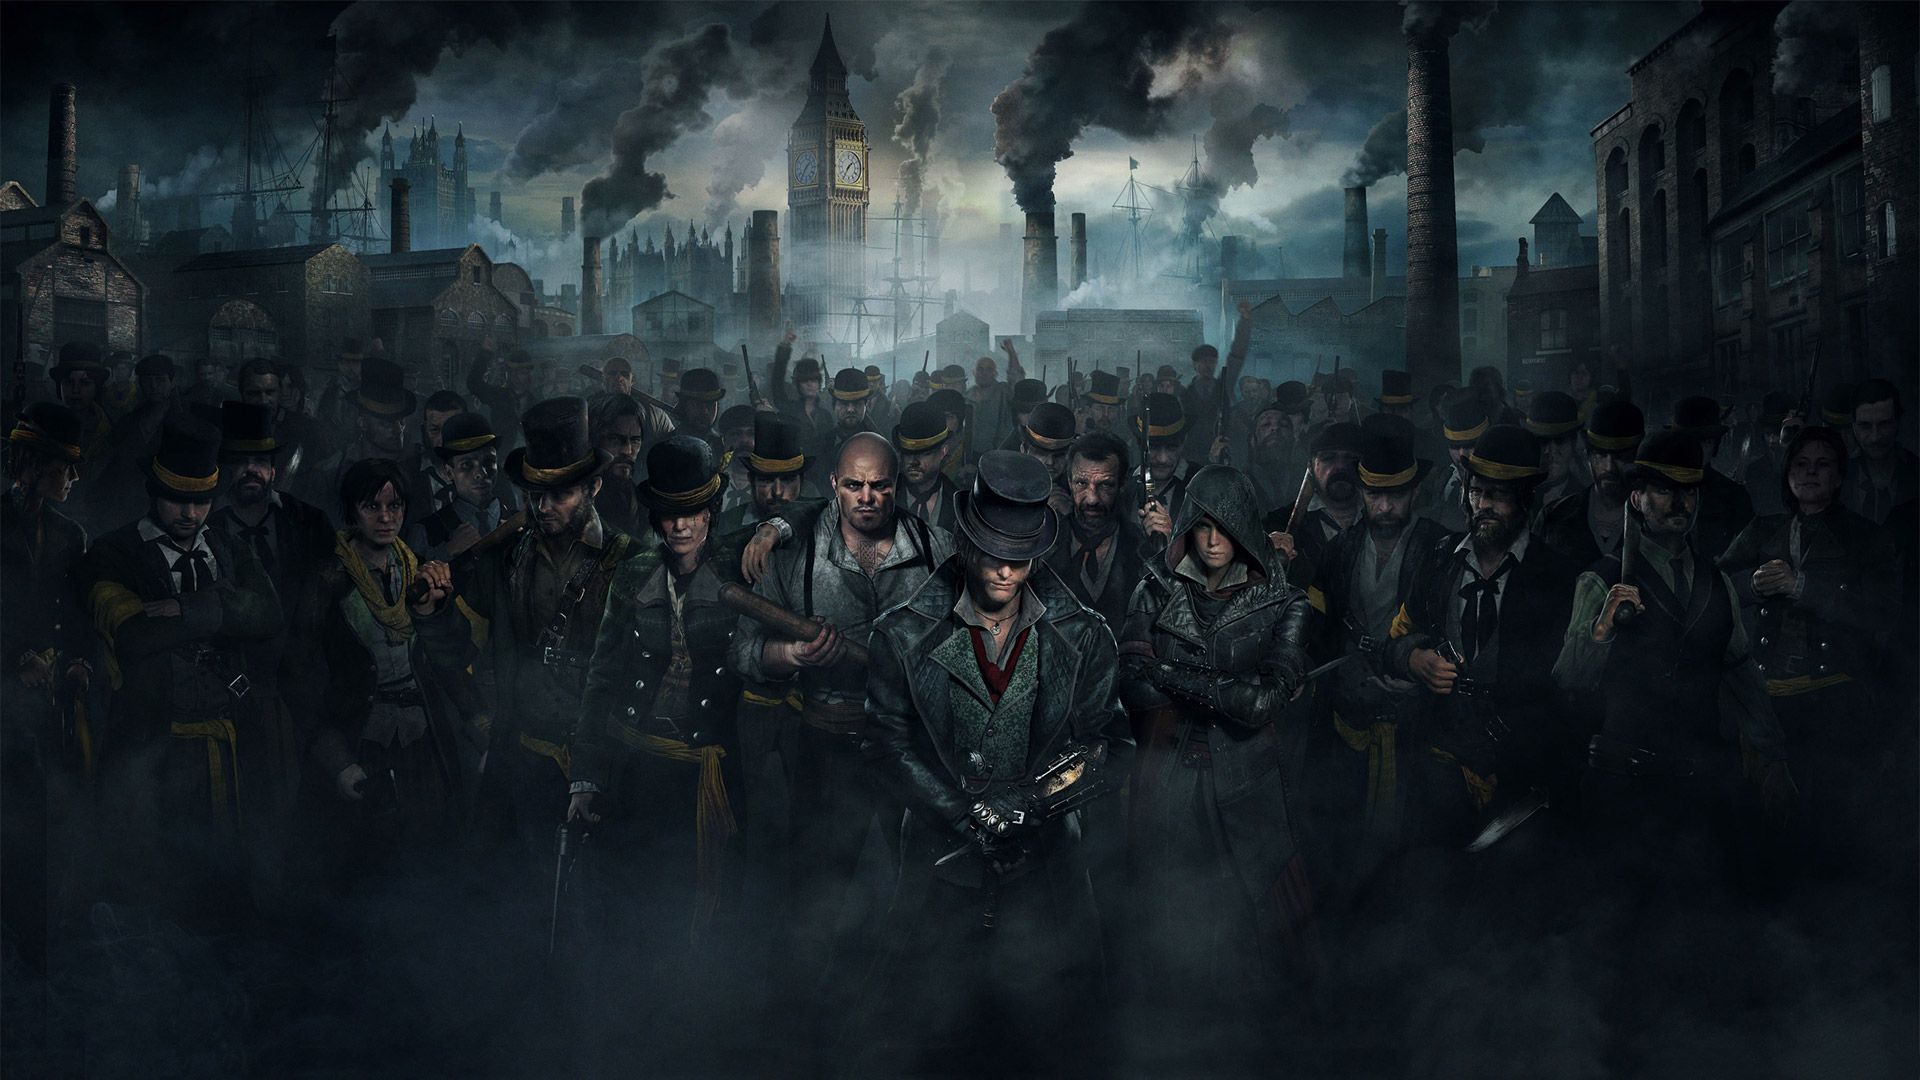 Assasins Creed Syndicate wallpaper 16